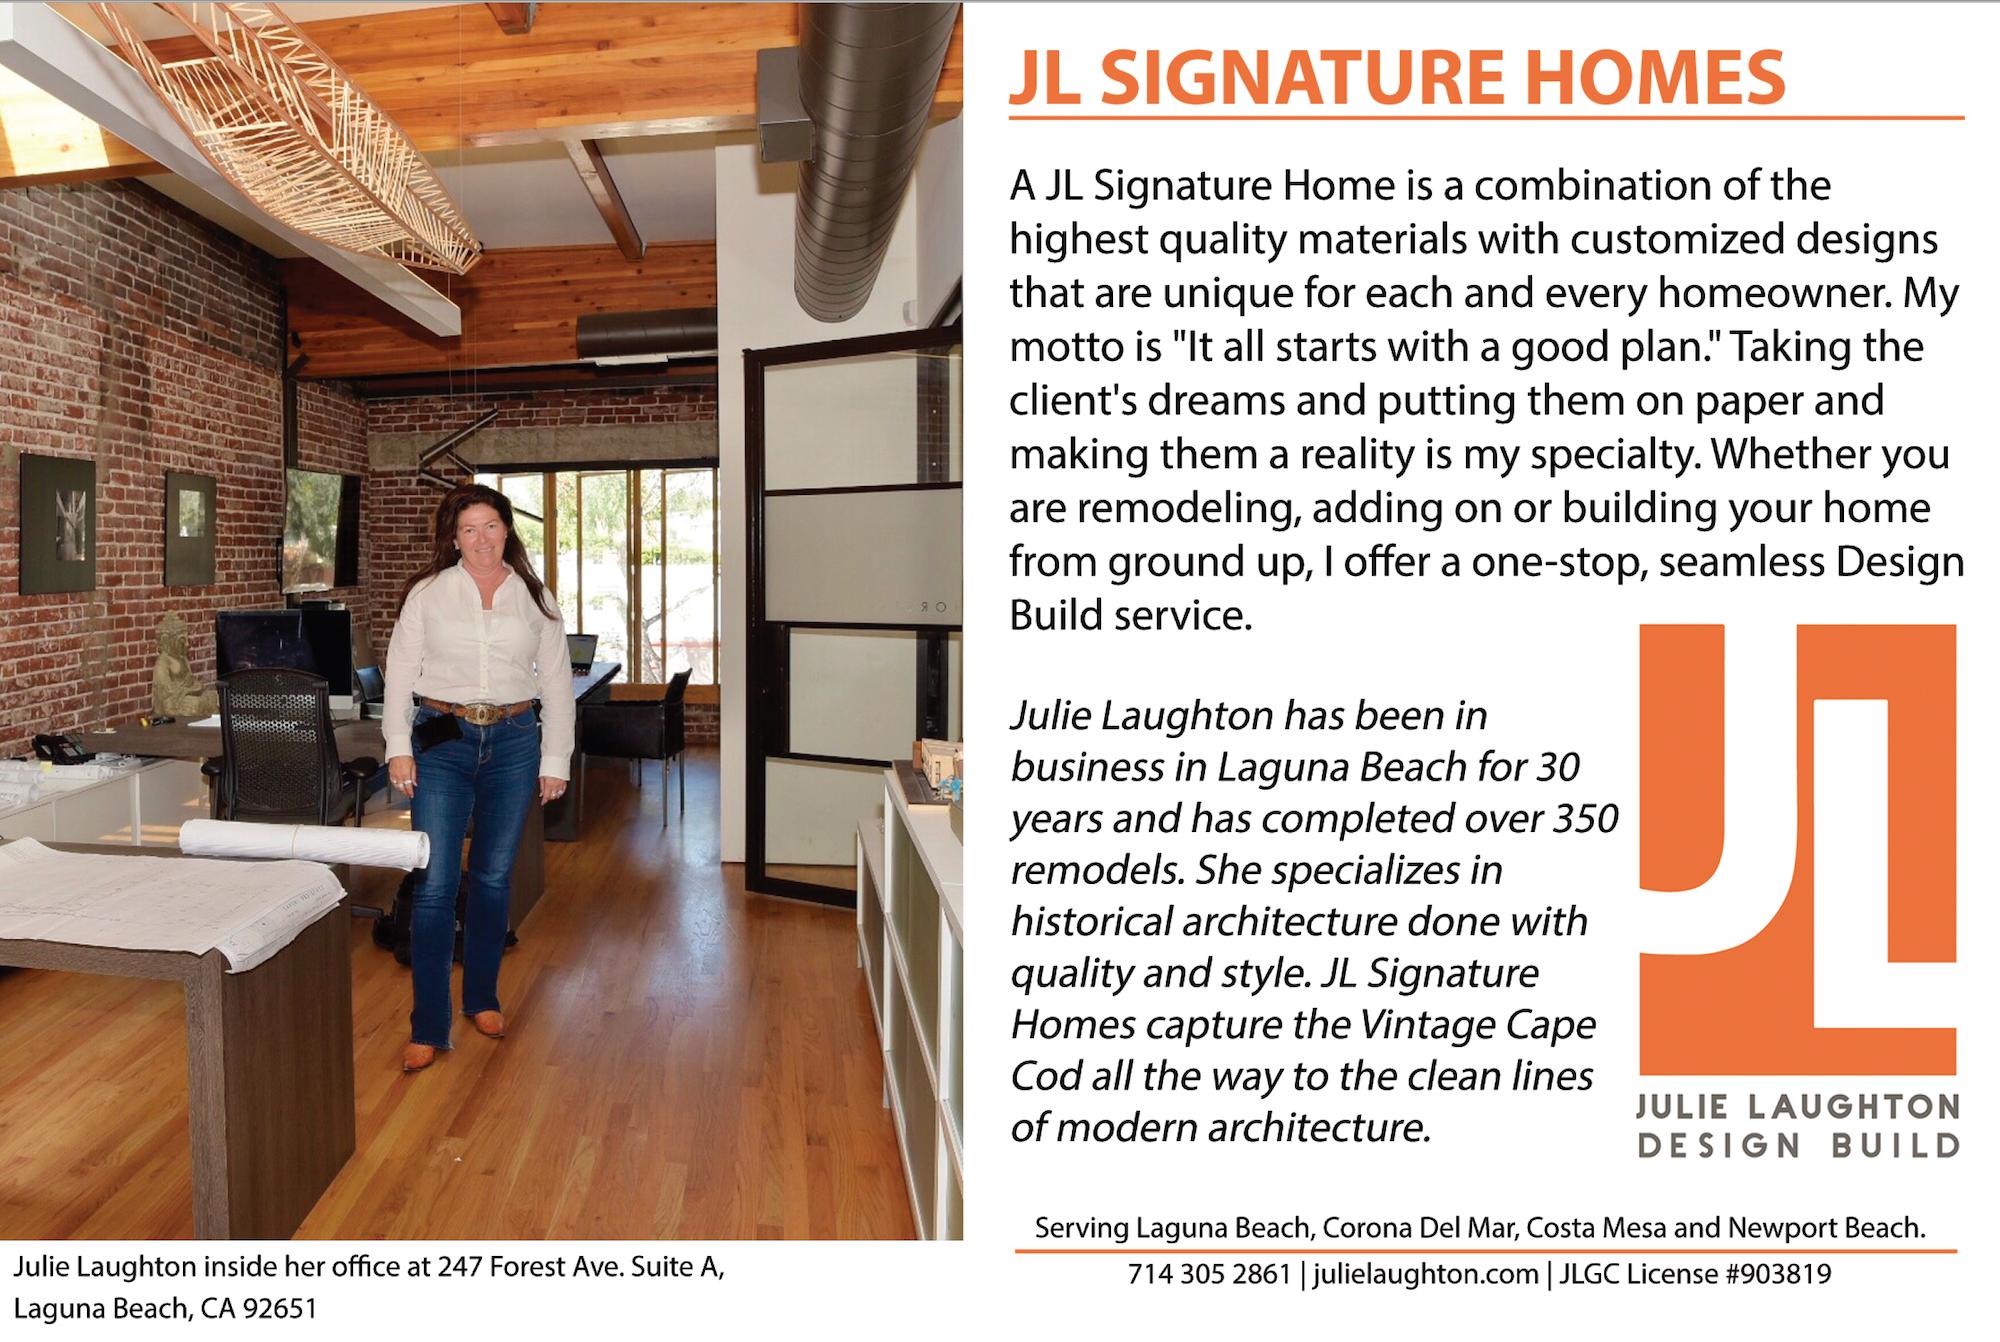 Julie Laughton Design Build image 0